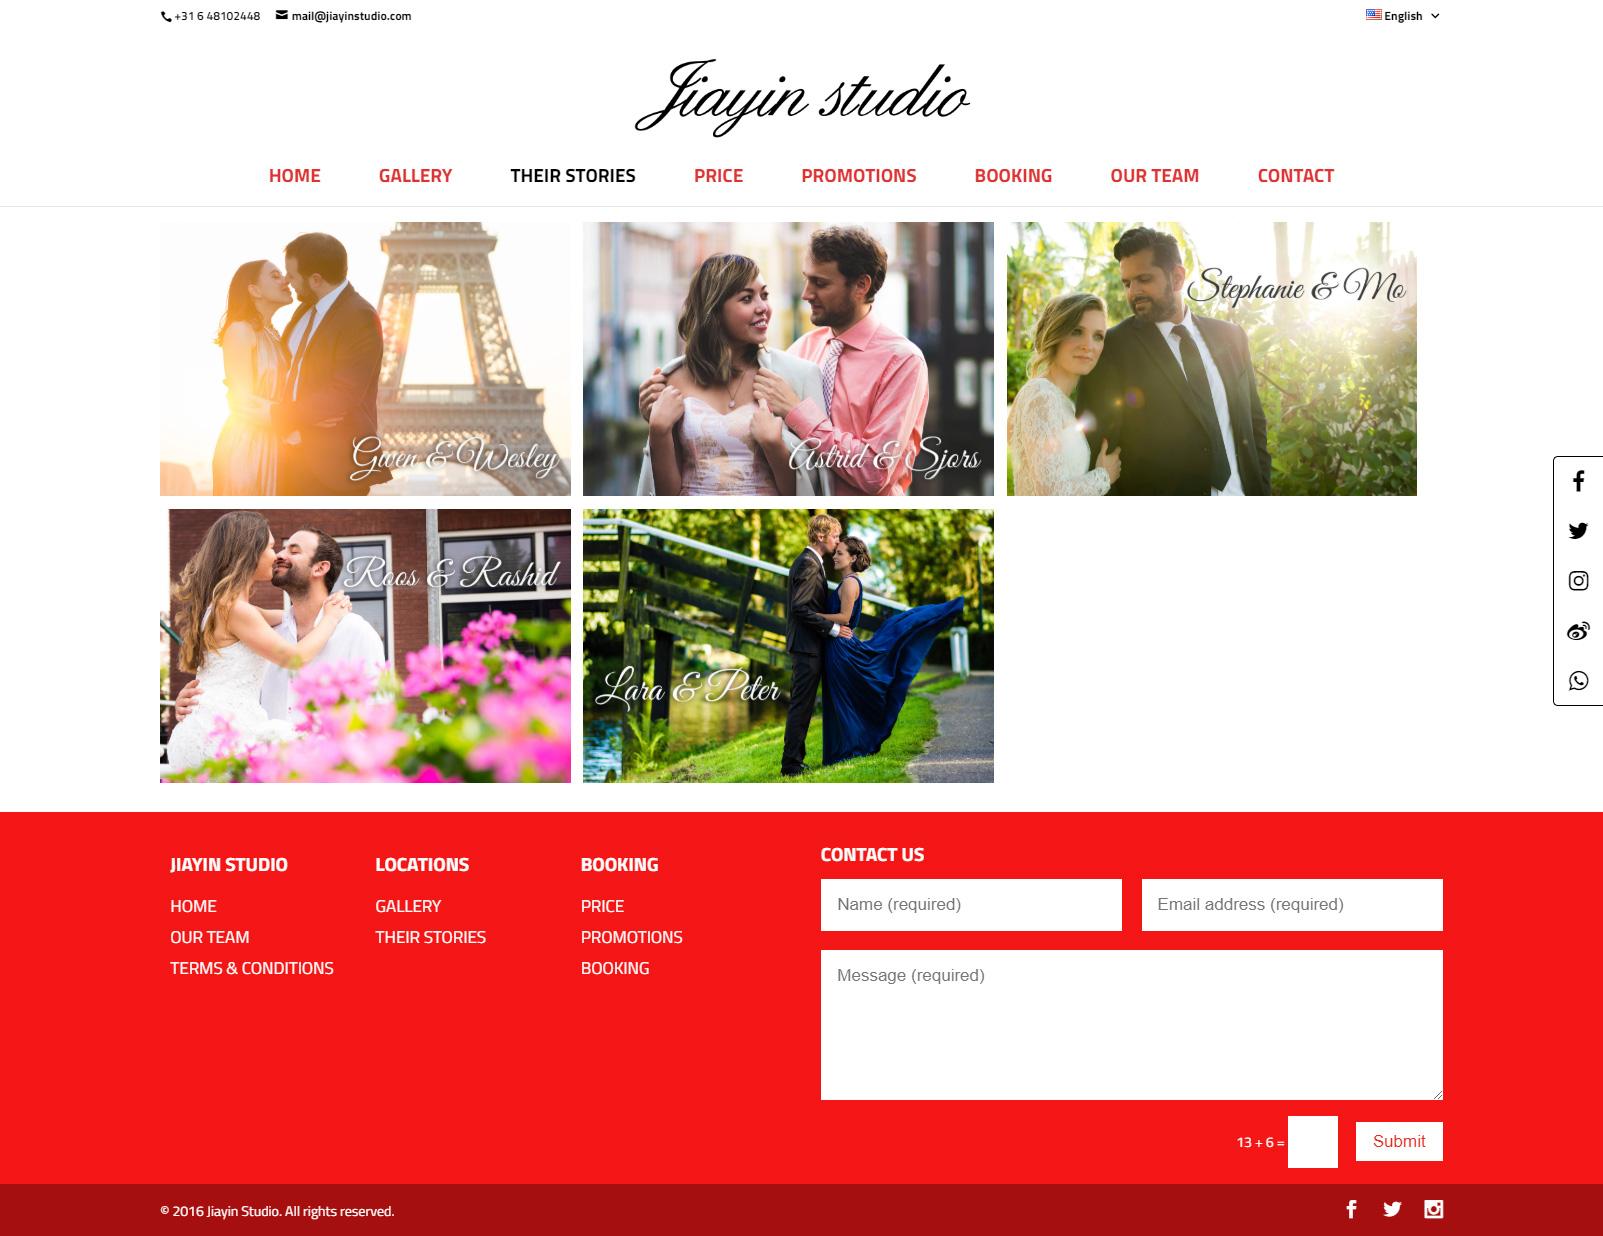 Jiayin Studio Their Stories Page